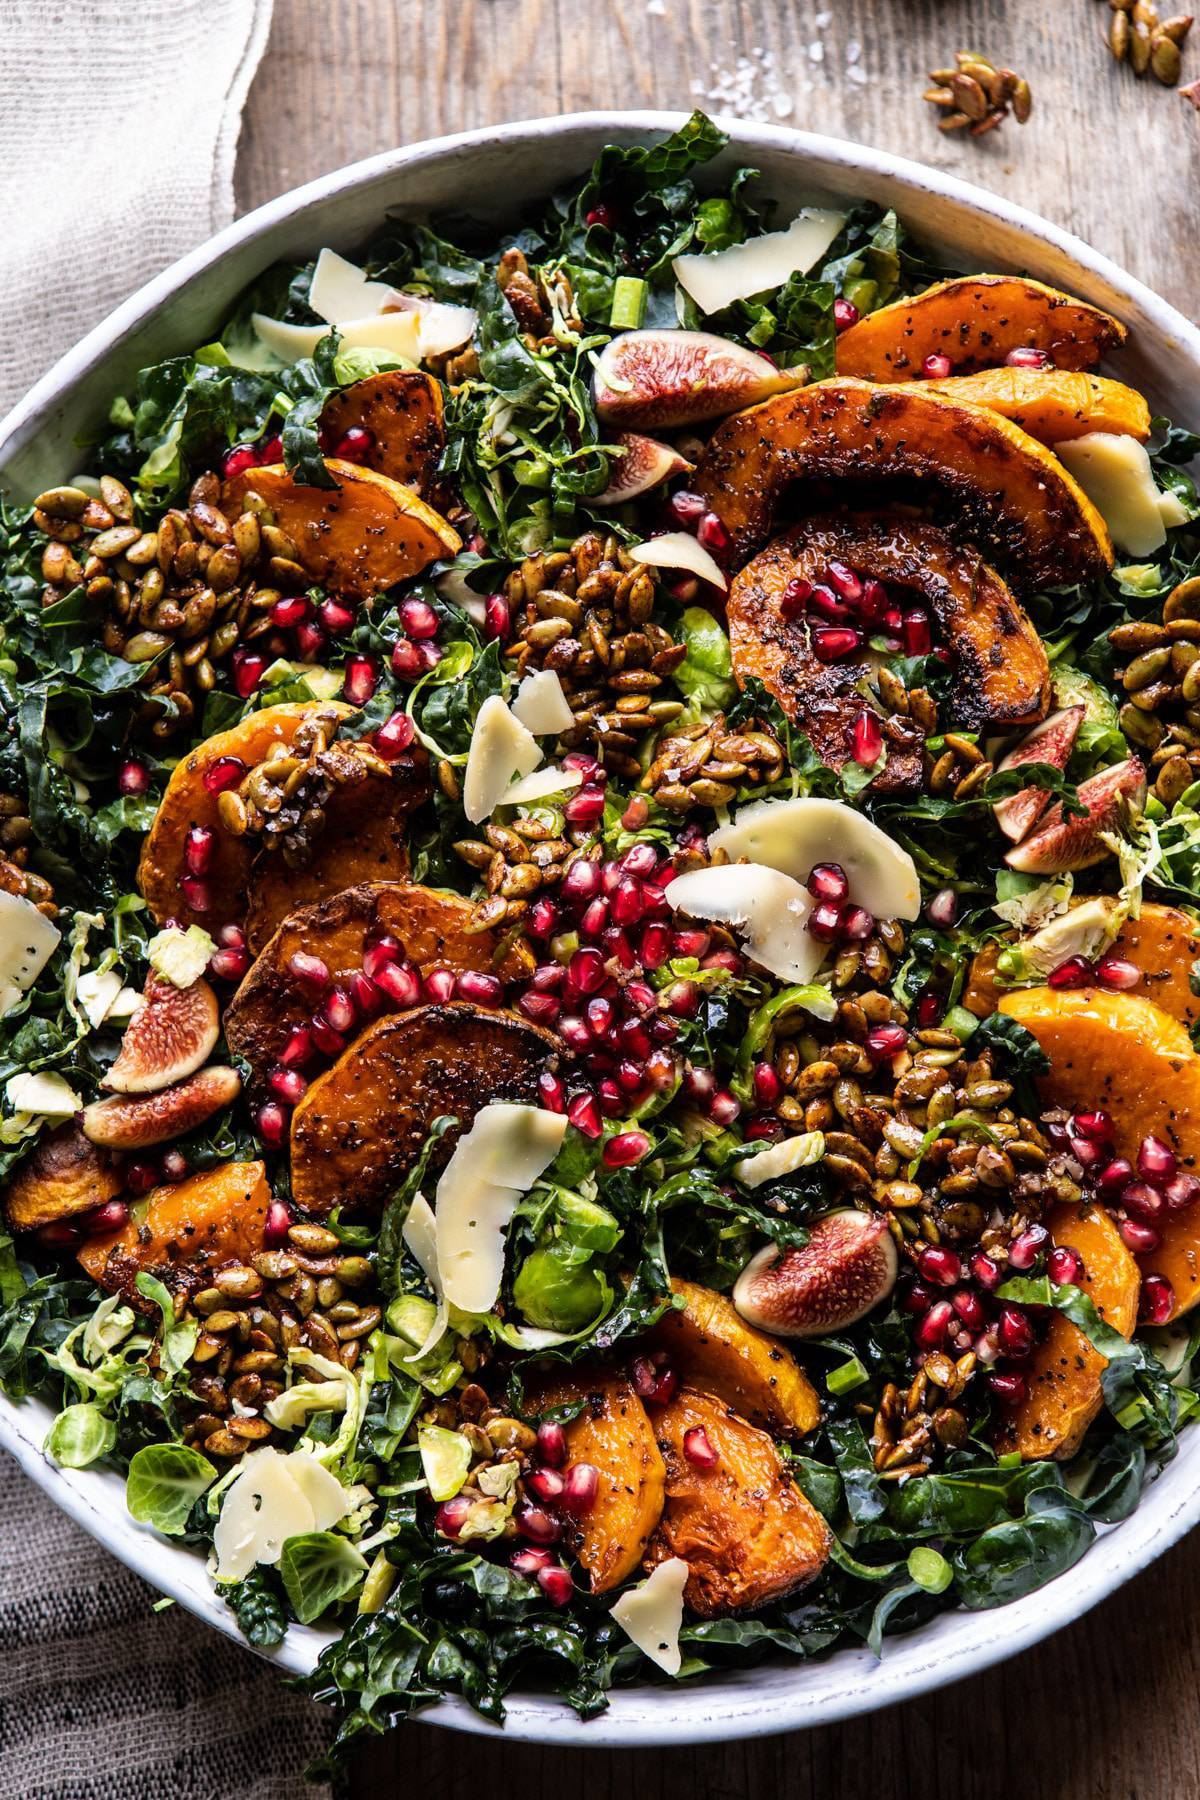 Fall Harvest Roasted Butternut Squash and Pomegranate Salad | halfbakedharvest.com #salad #autumnrecipes #easyrecipes #healthy #butternutsquash